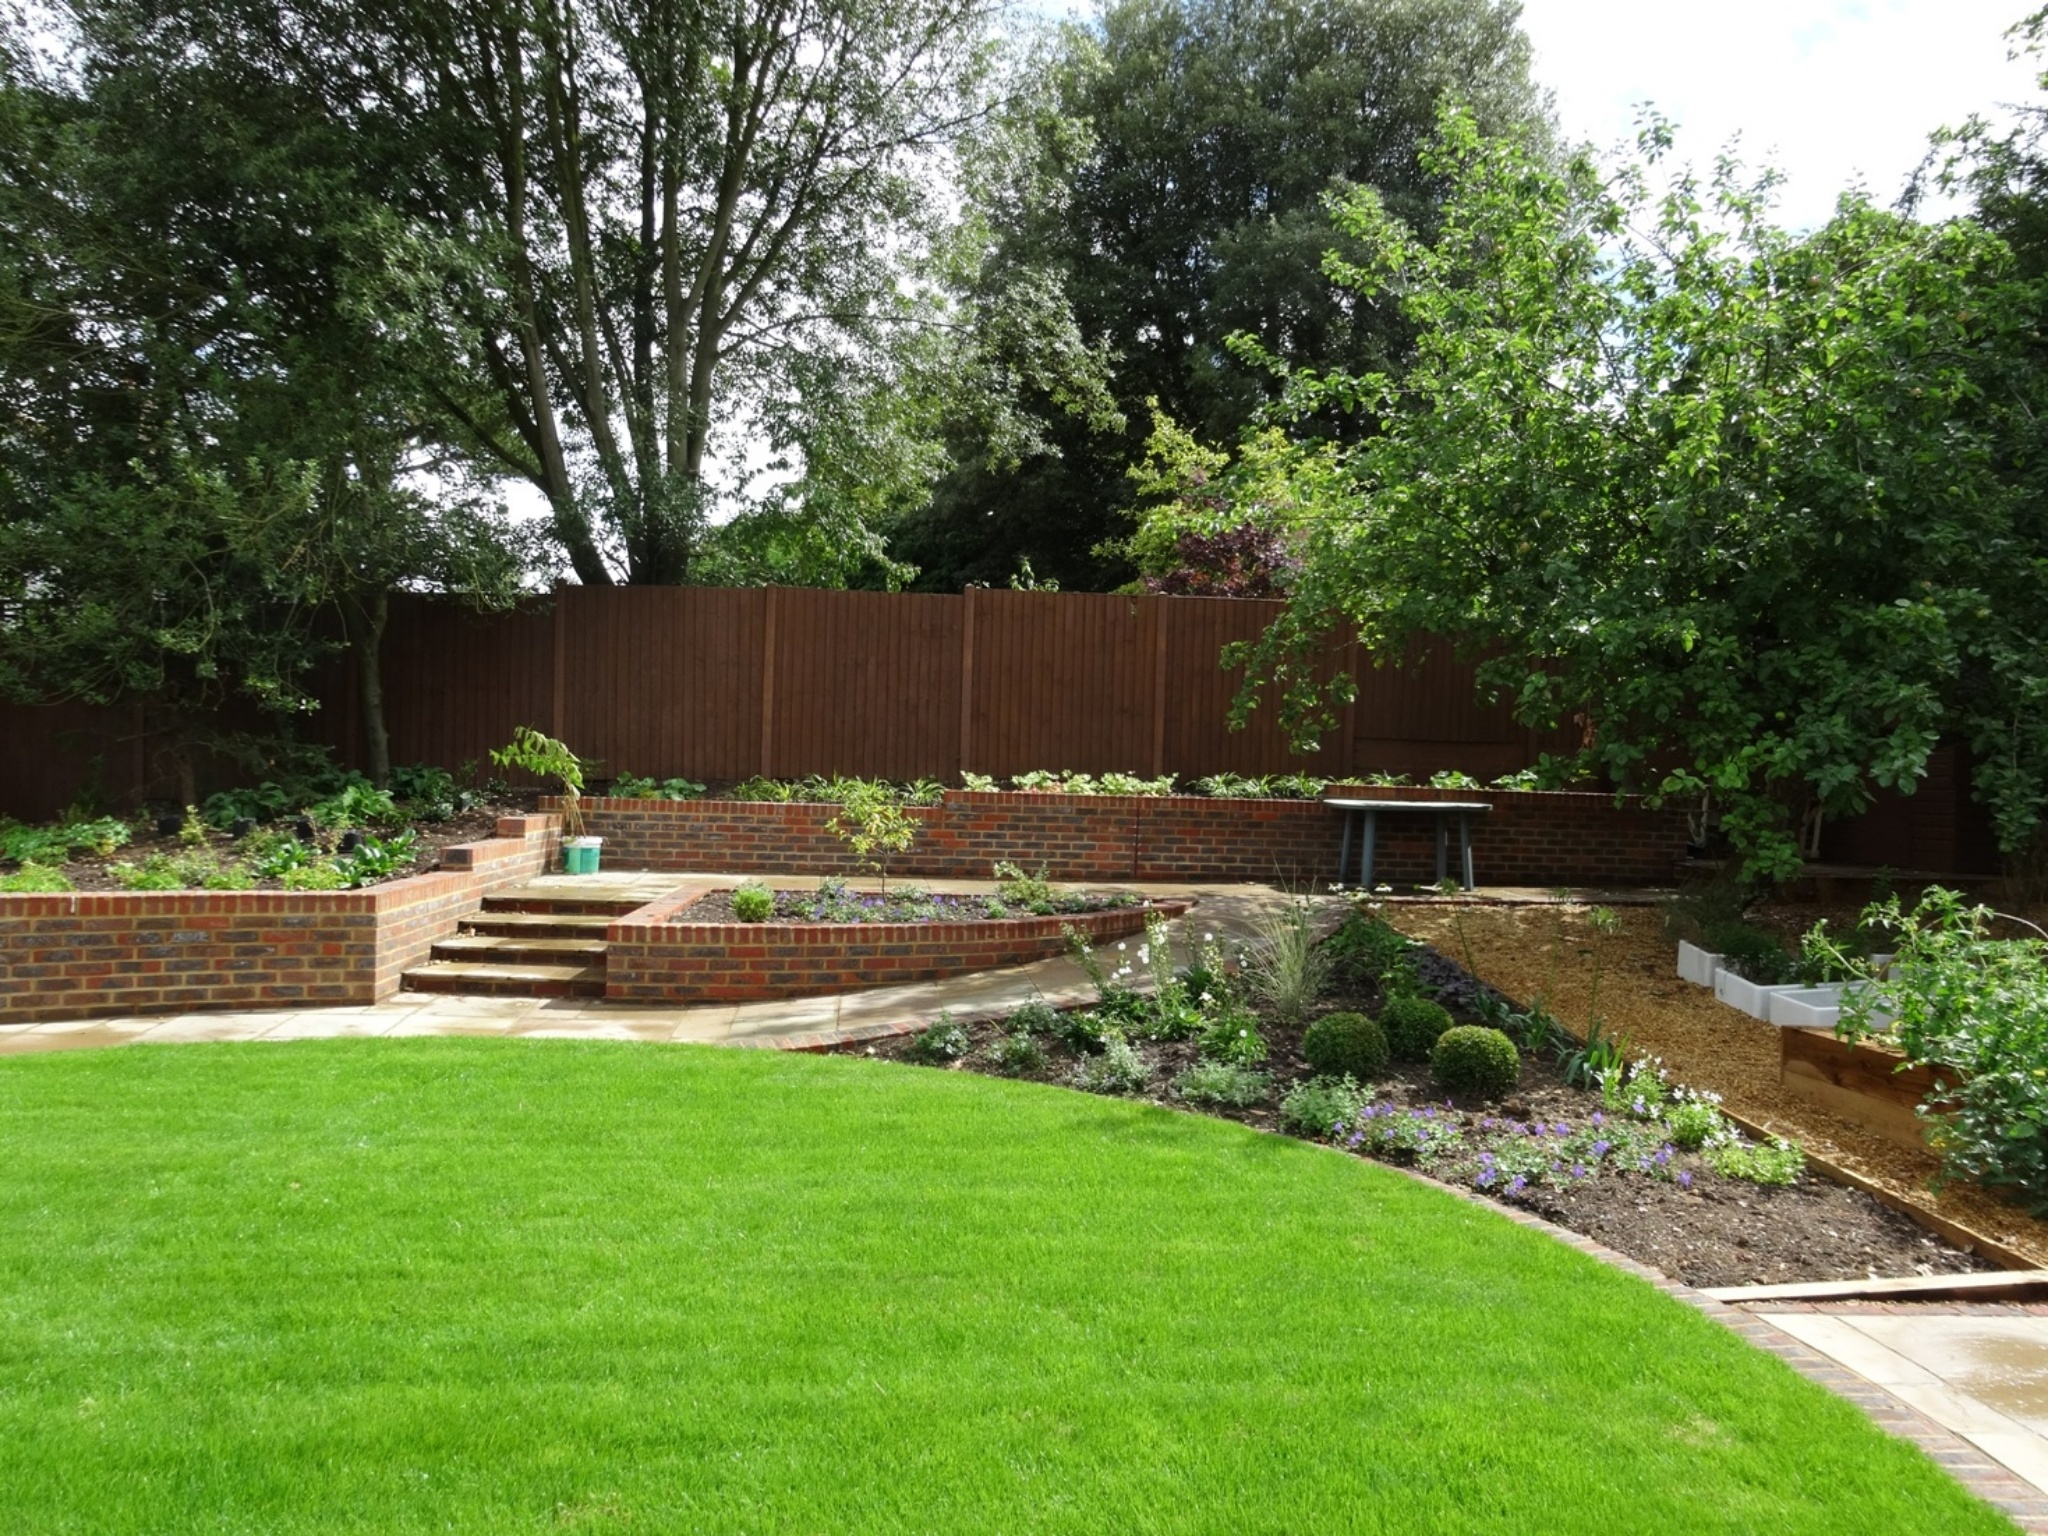 Garden Walls, Lawn & Planting